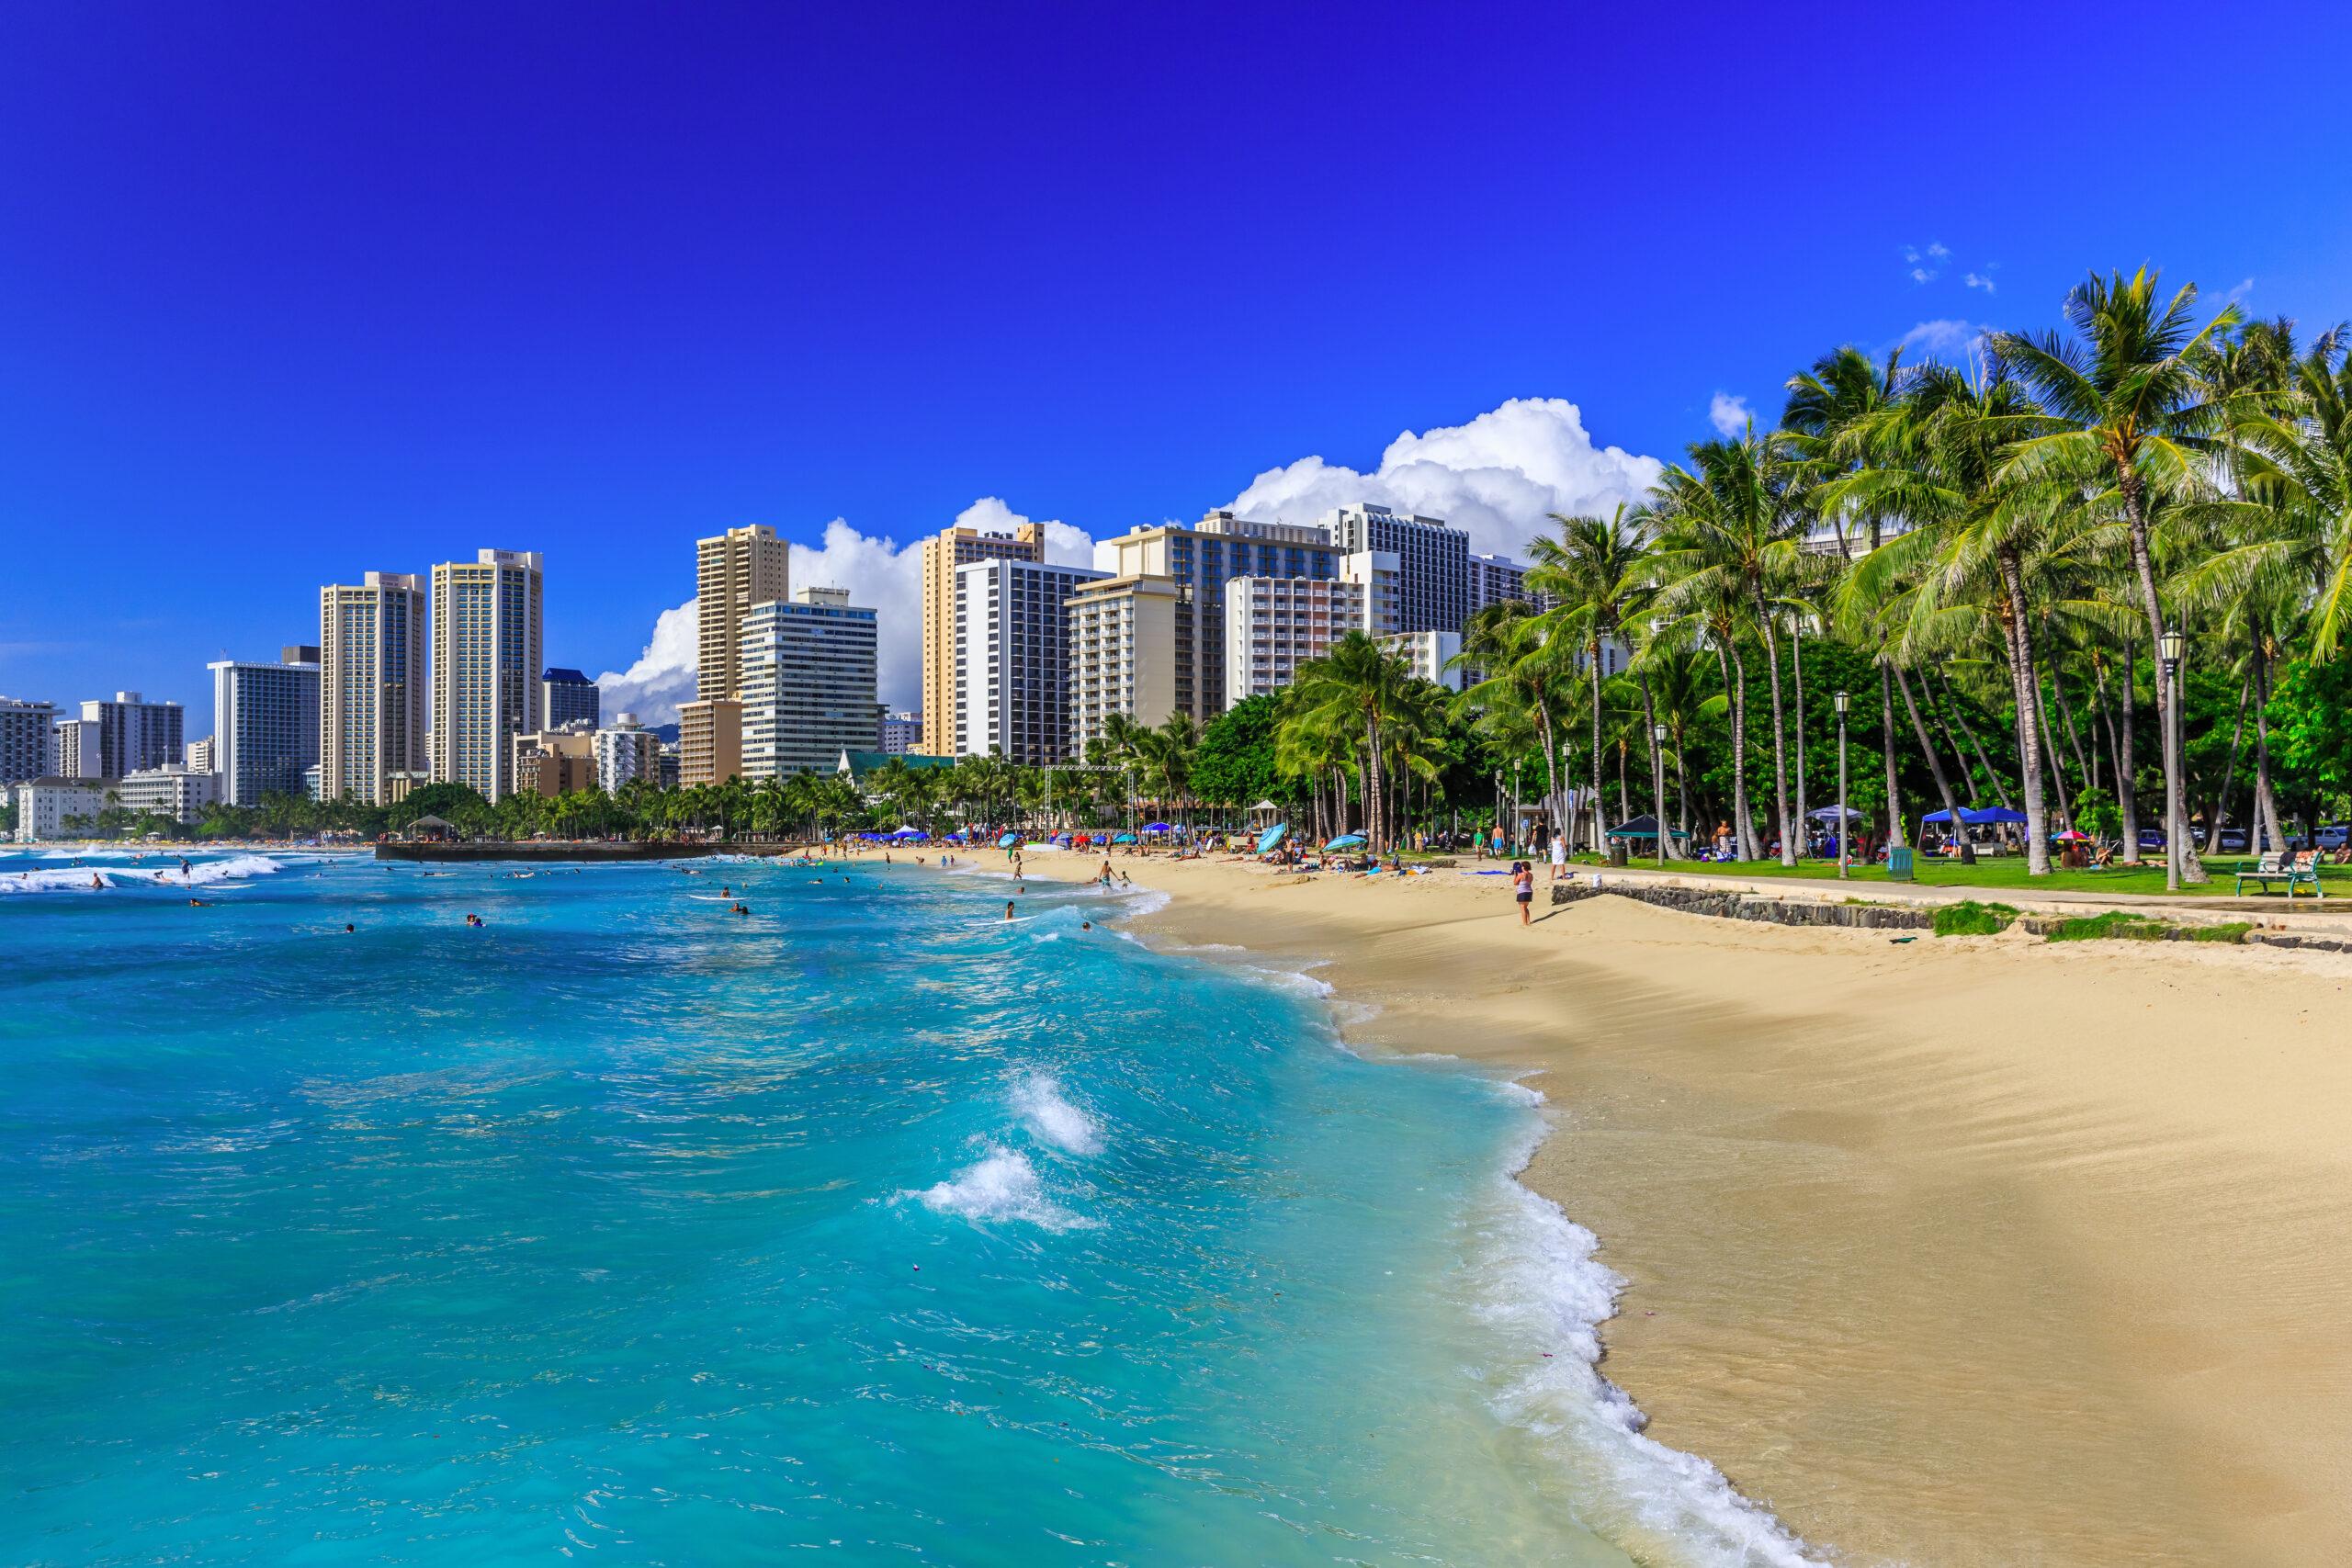 cruising around Hawaii - Honolulu, Hawaii. Waikiki beach and Honolulu's skyline.